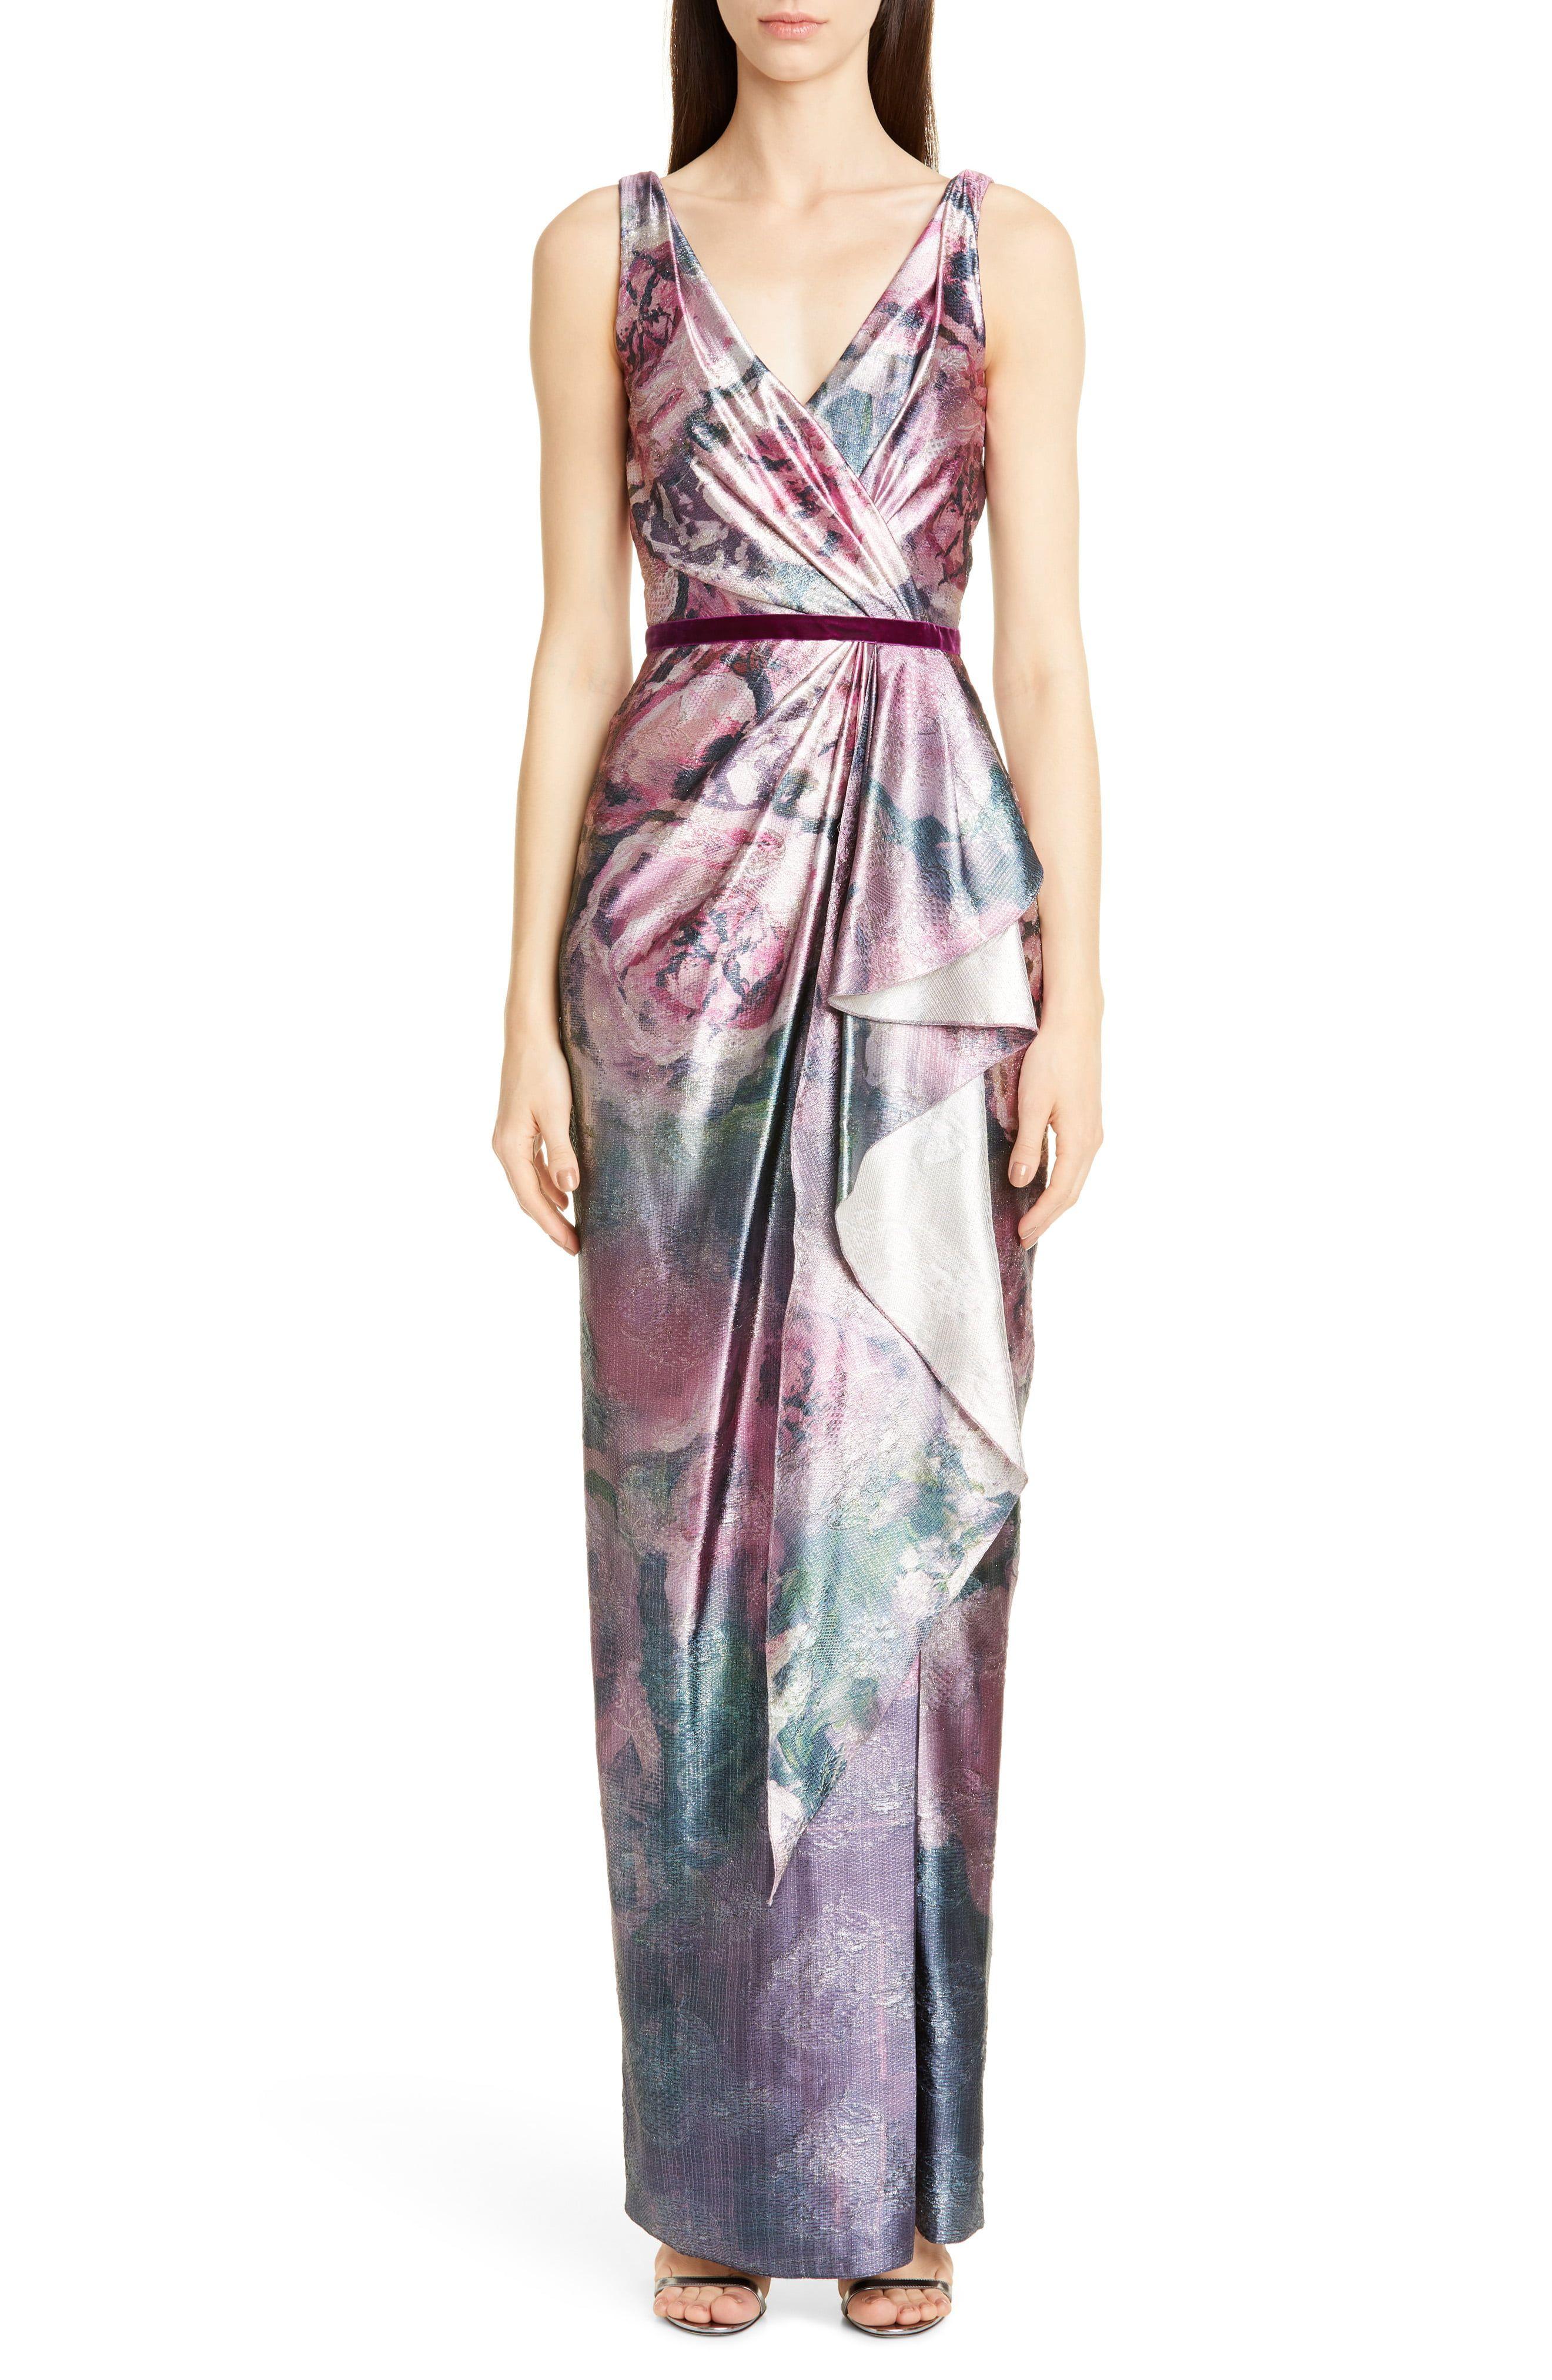 Marchesa Notte Draped Metallic Floral Gown